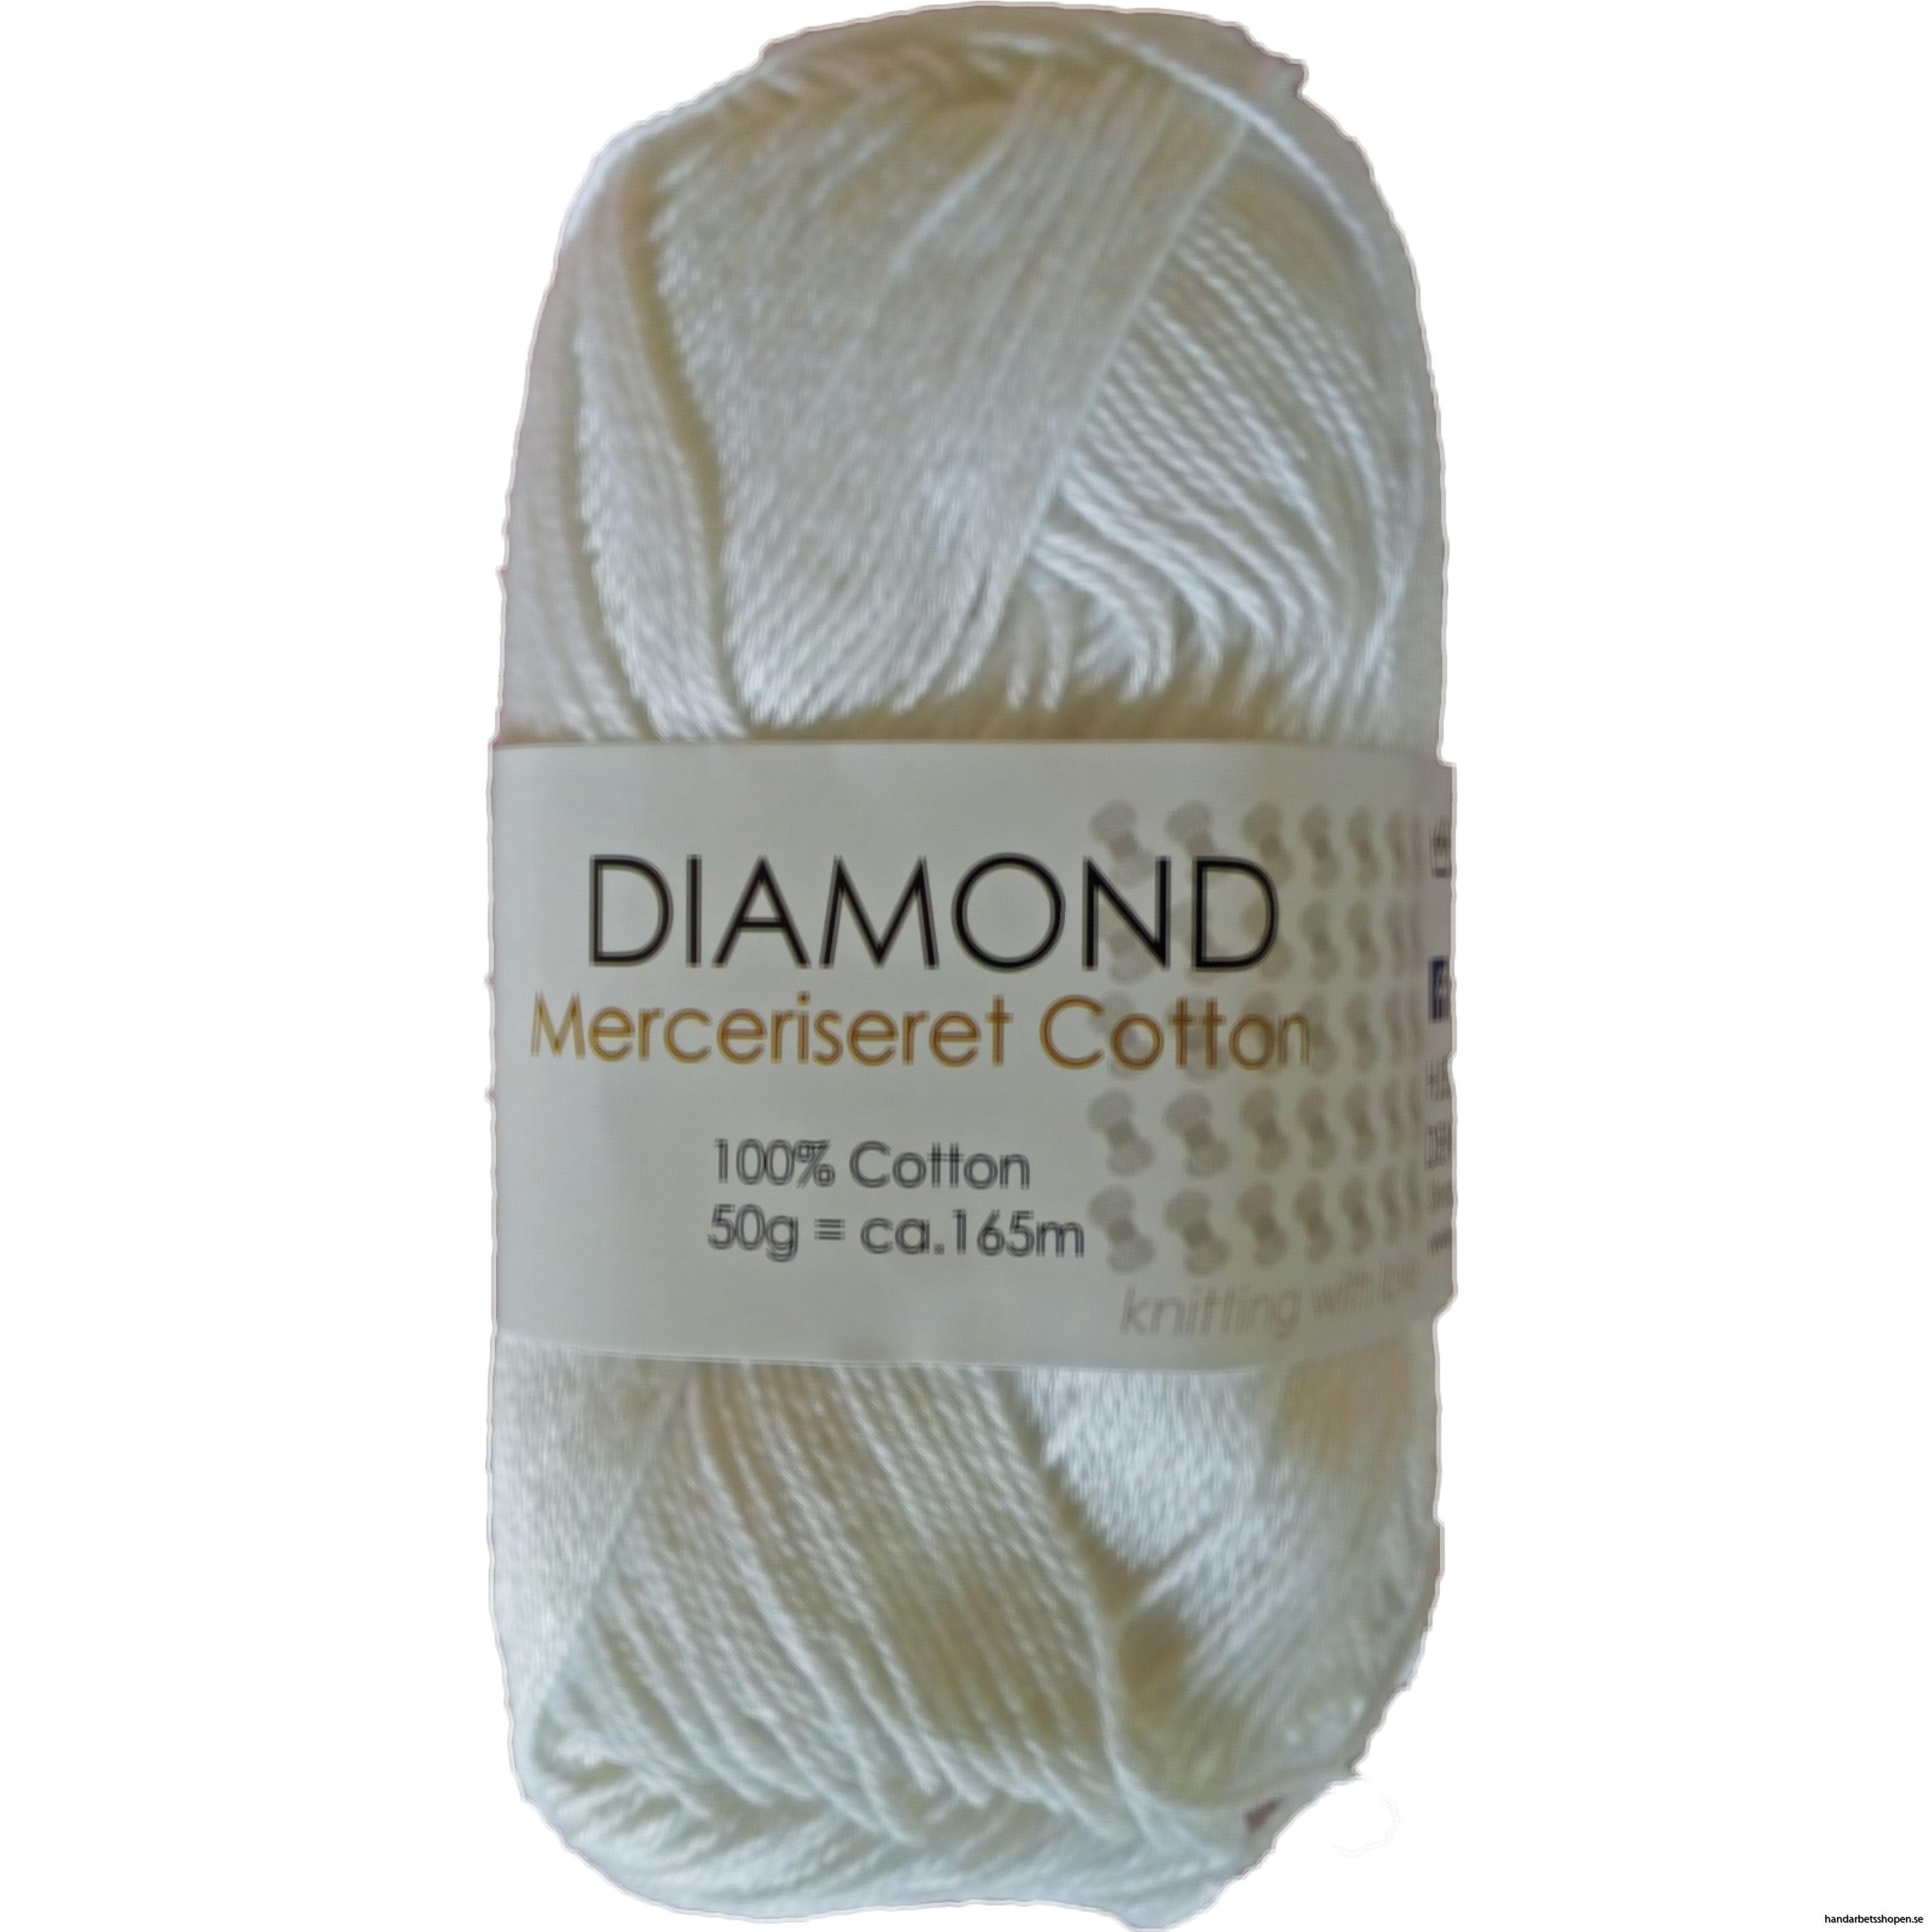 Diamond 100 22 3 (1) vit